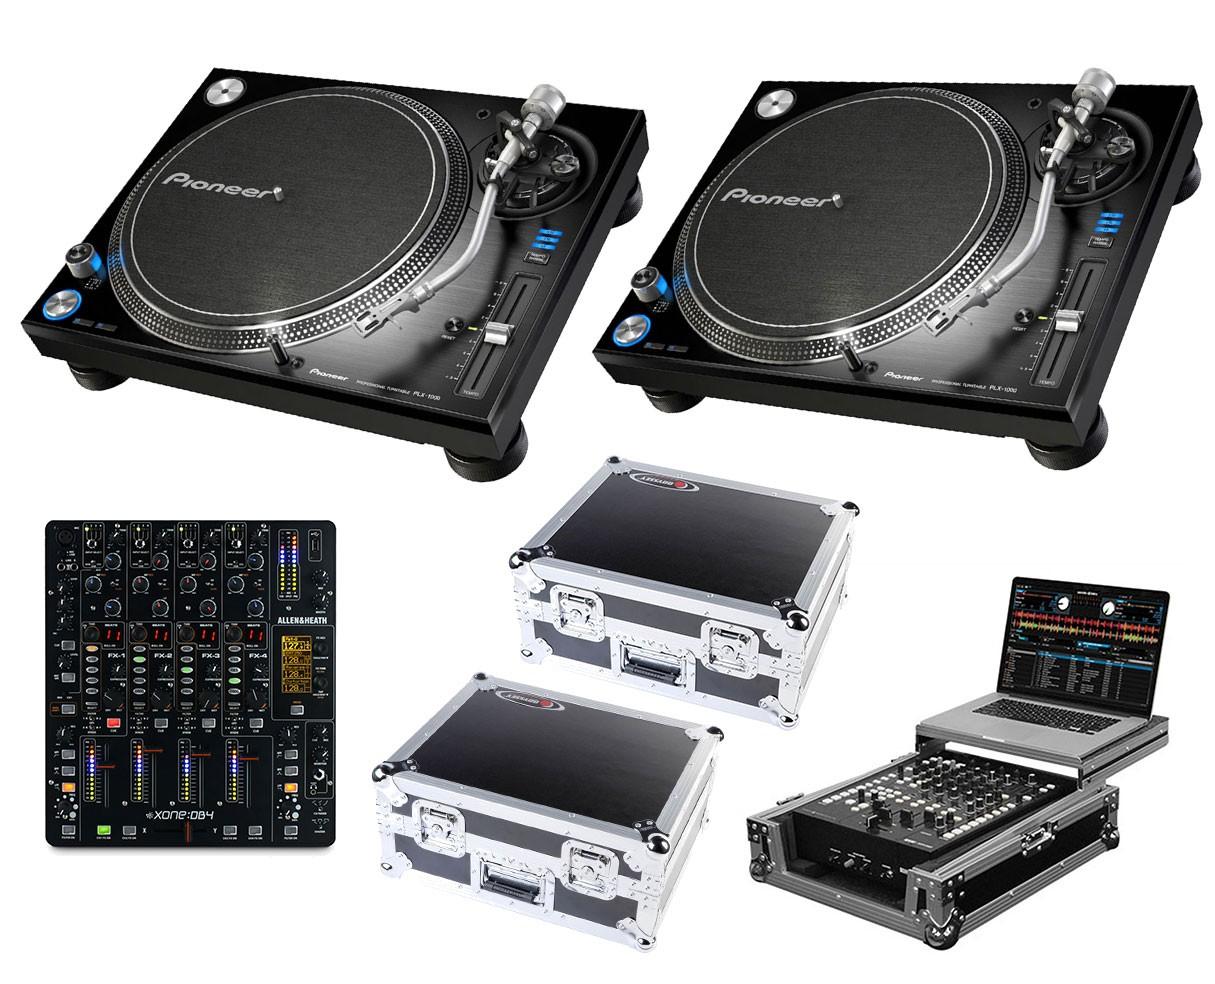 2x Pioneer PLX-1000 + Xone:DB4 + Odyssey Cases + Glide Style Case